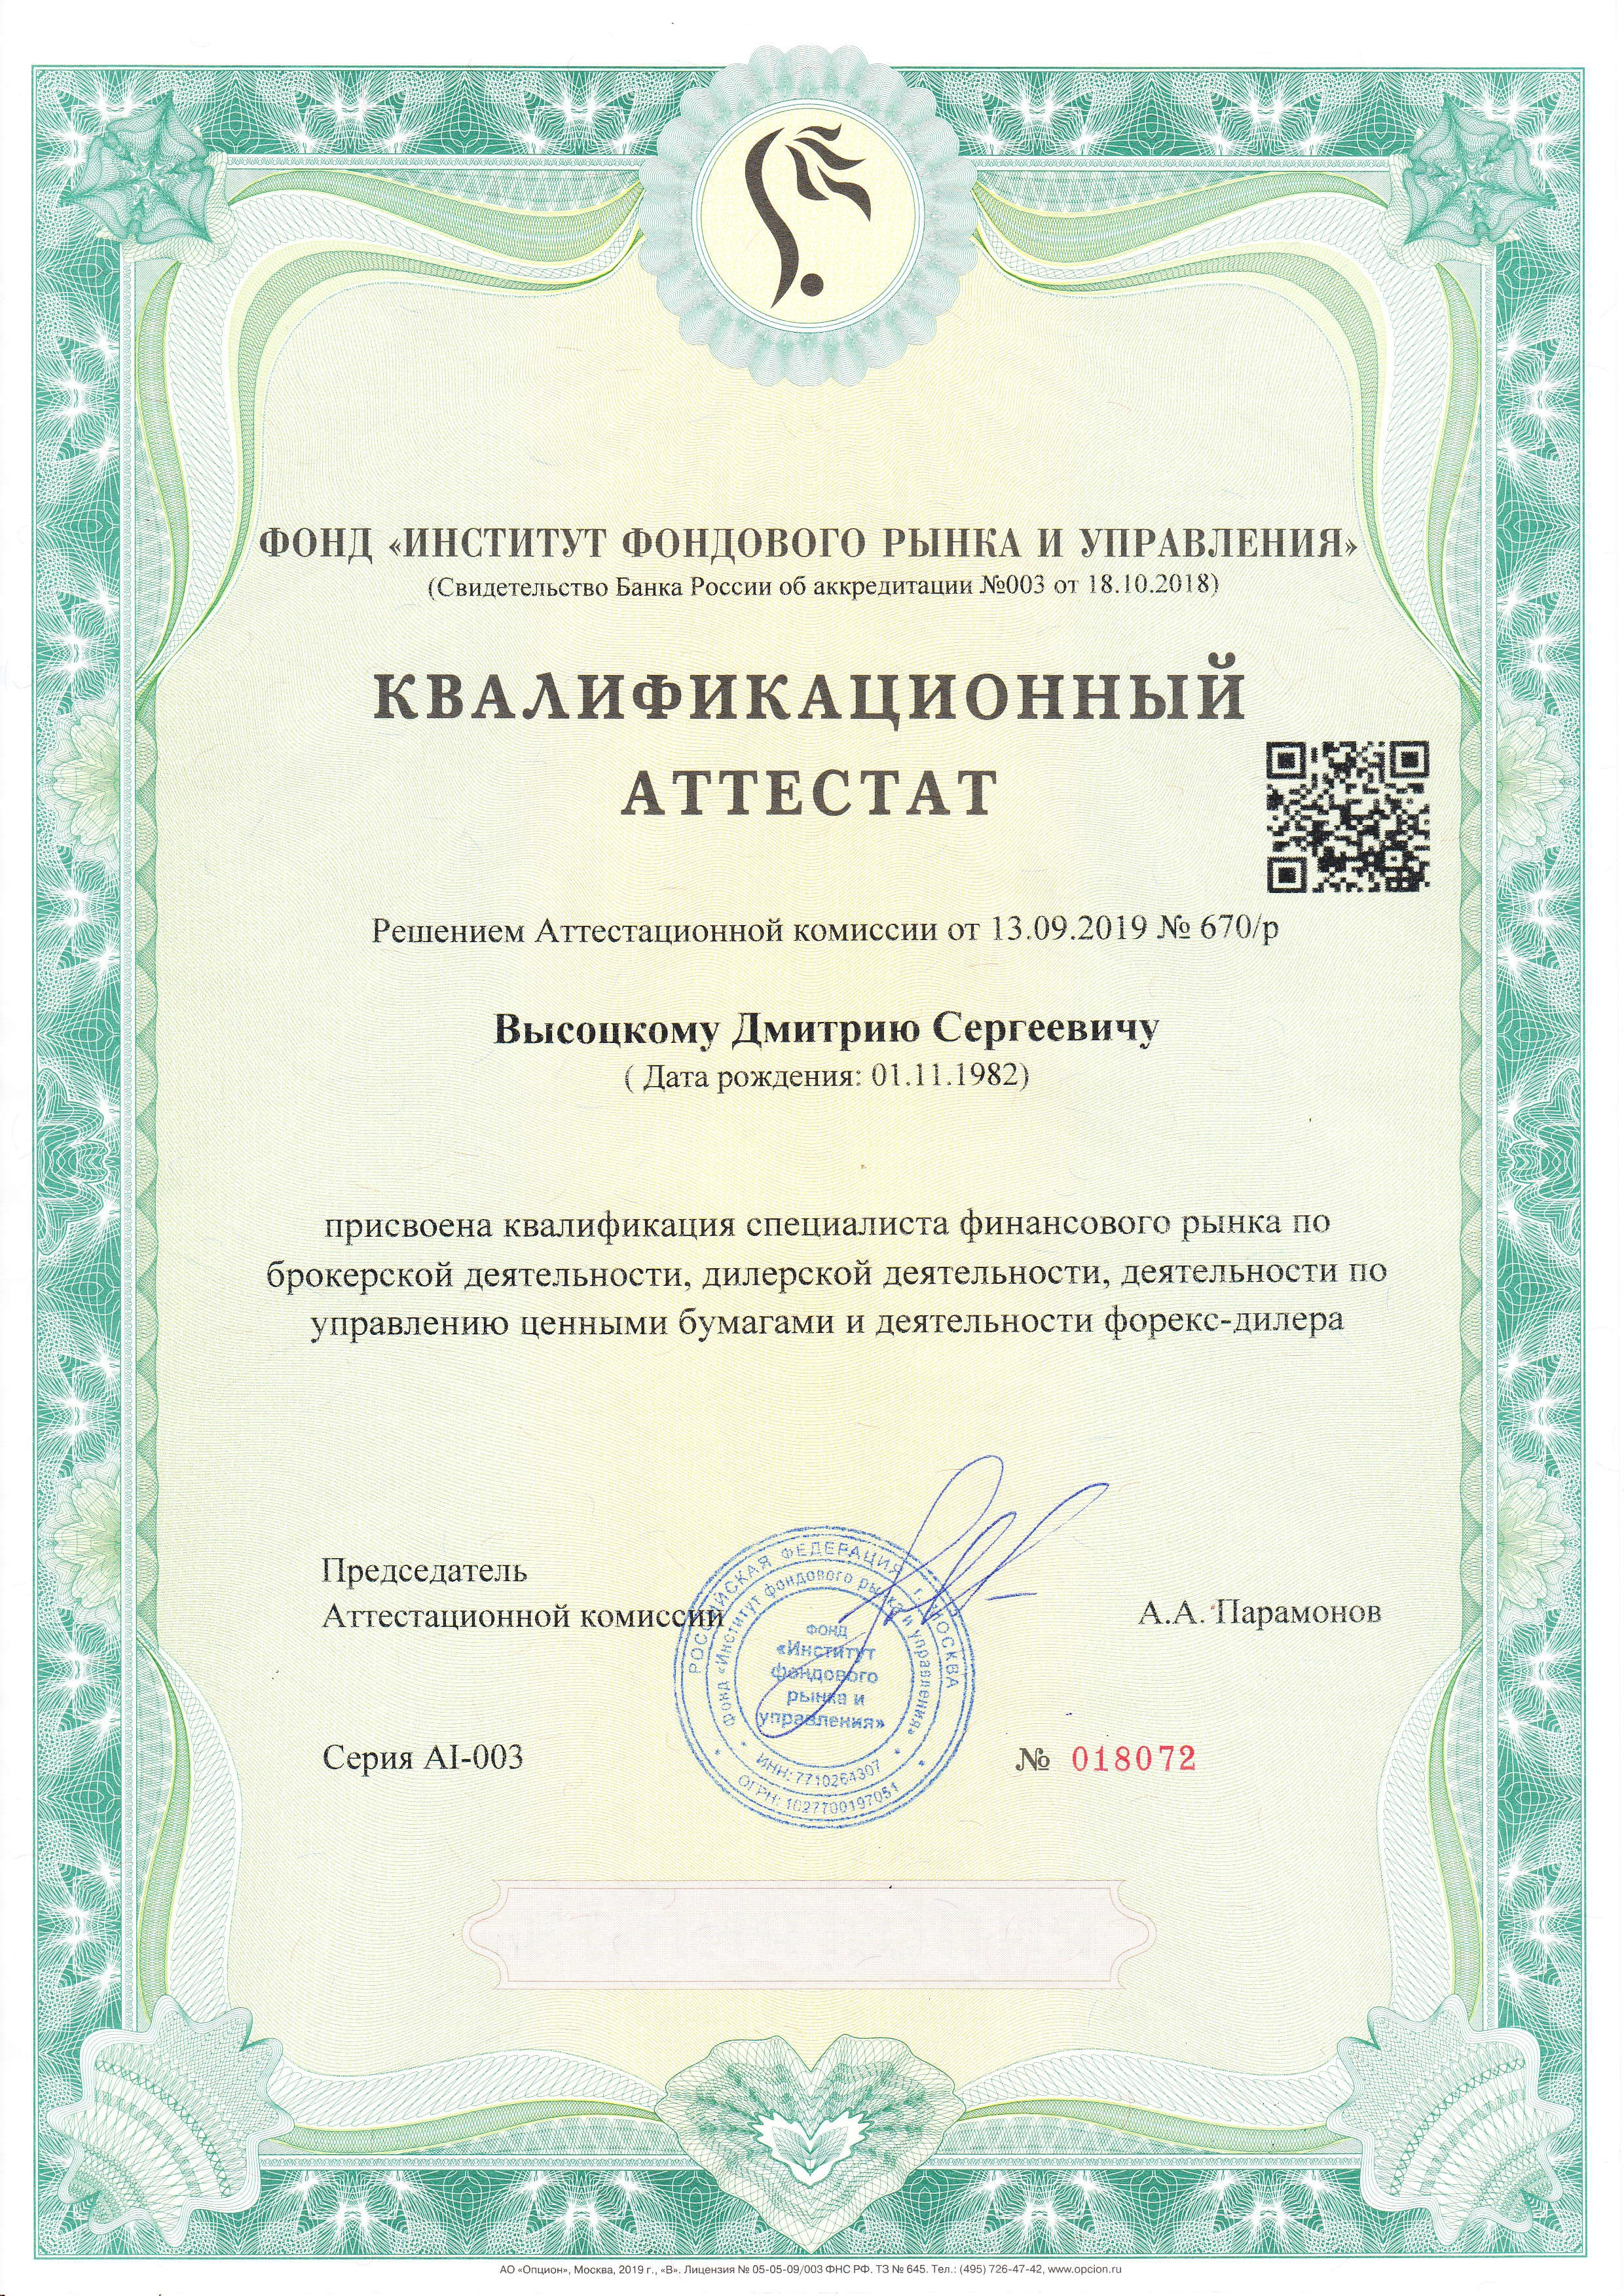 Высоцкий-Аттестат-ФСФР